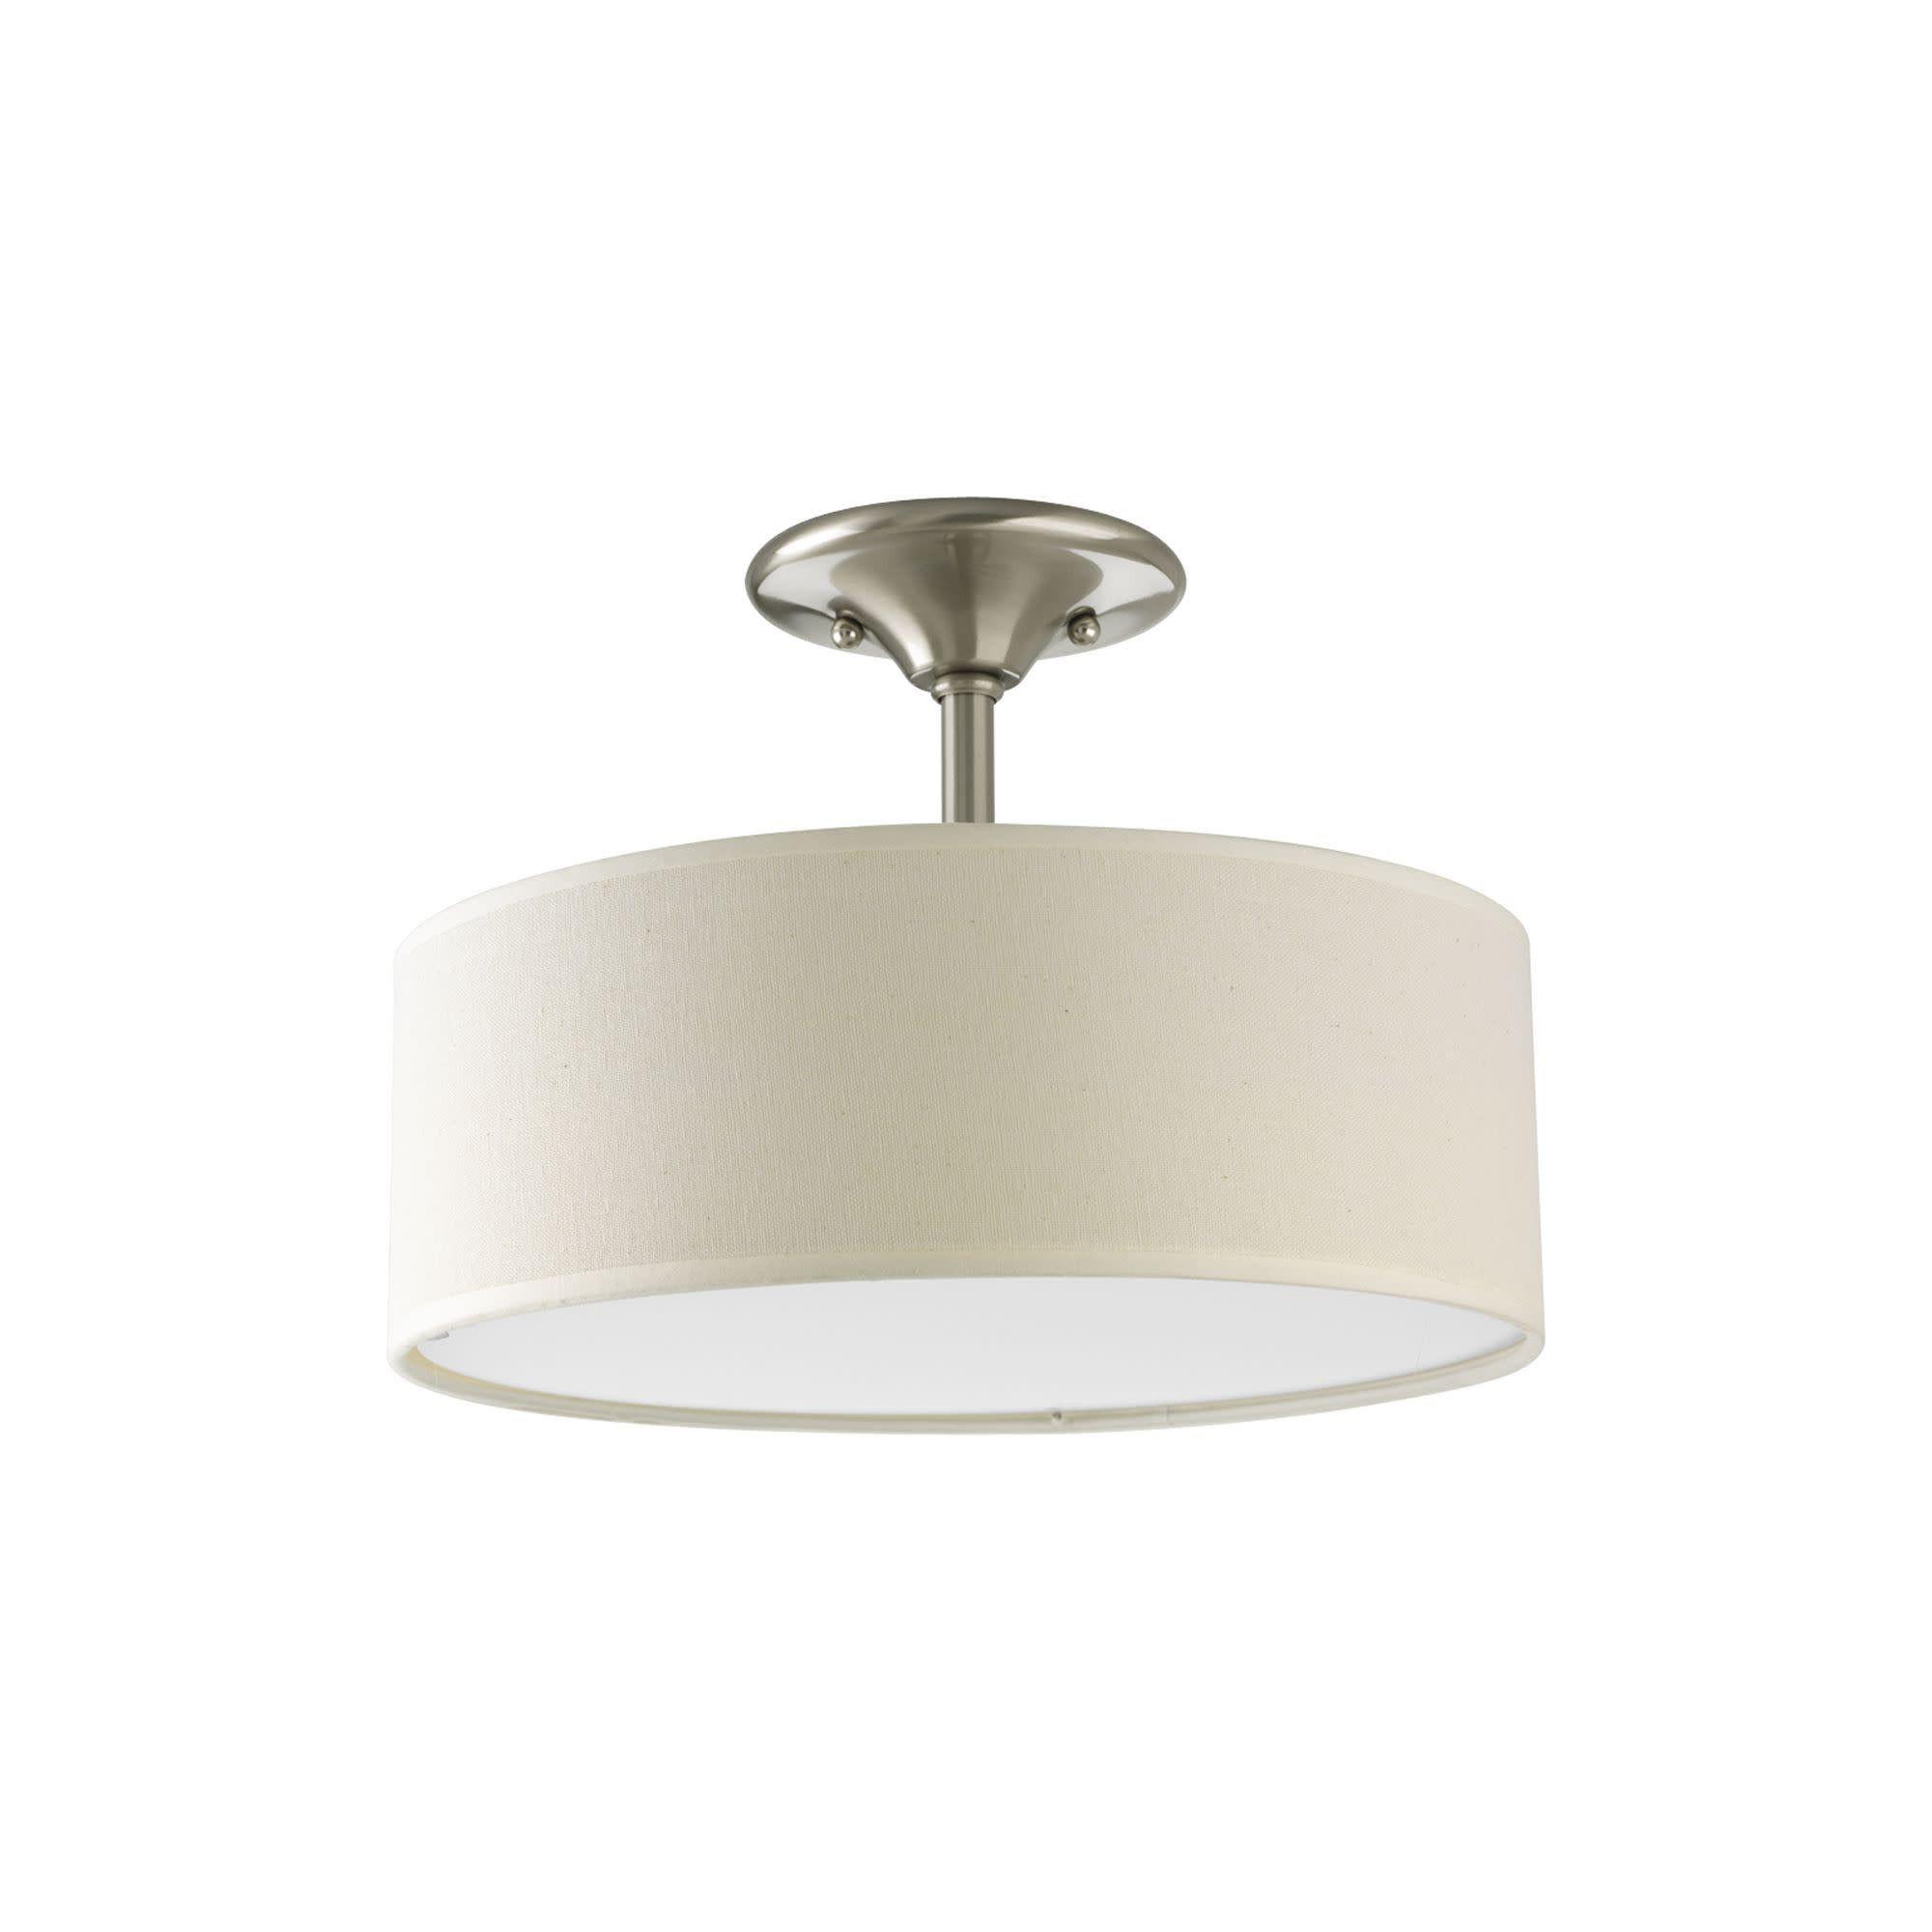 Progress Lighting P3939 Inspire 2 Light Semi Flush Mount Ceiling Fixture With Linen Shade 13 Ceiling Fixtures Flush Mount Ceiling Progress Lighting